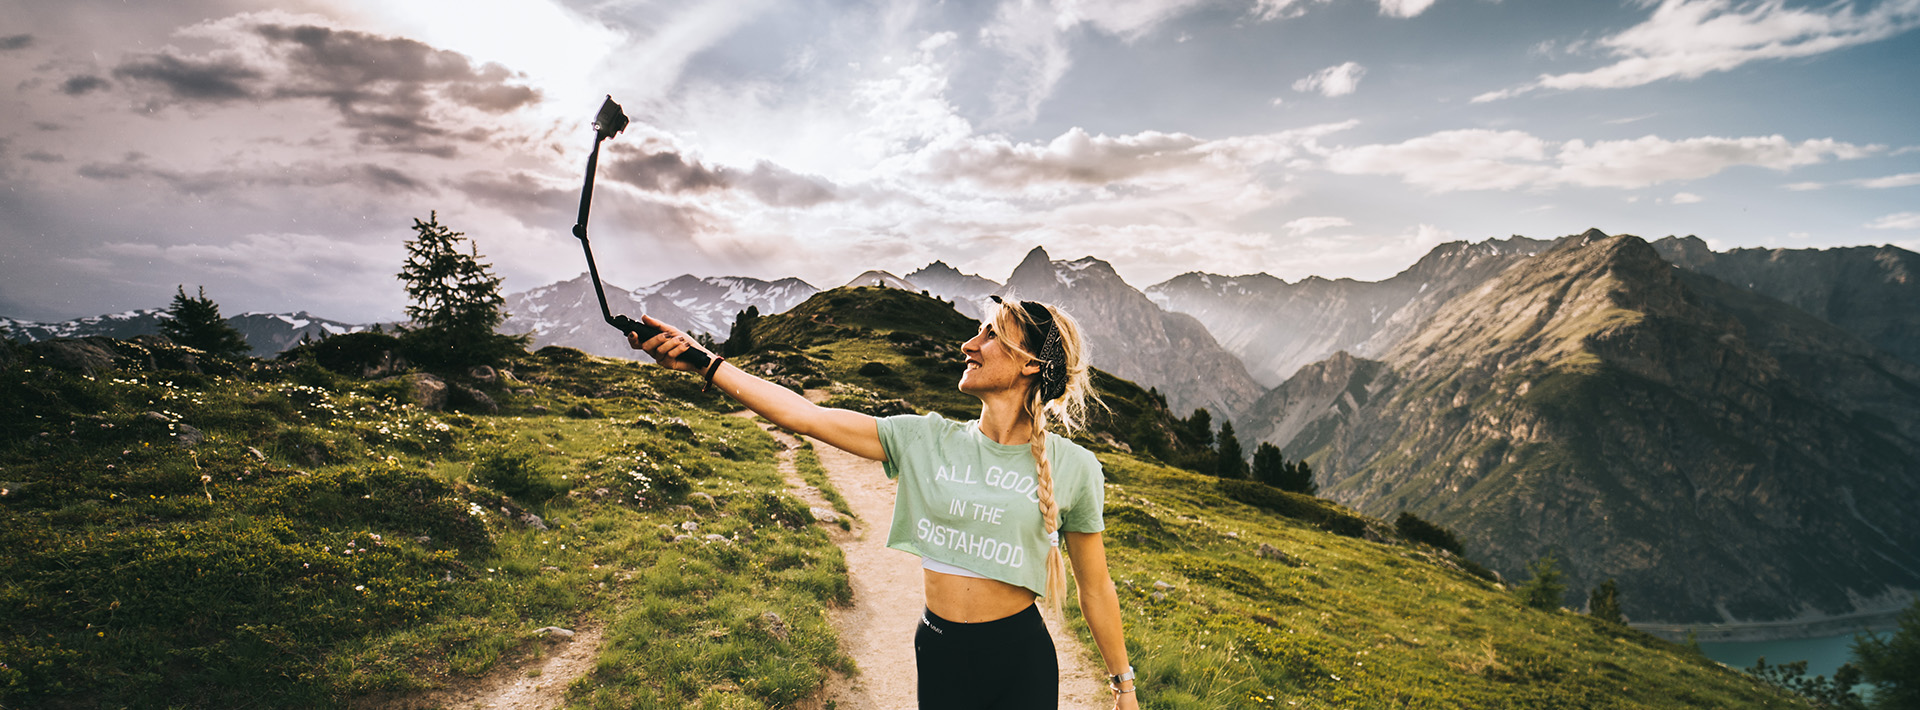 Mottolino, fun Mountain sulle Alpi